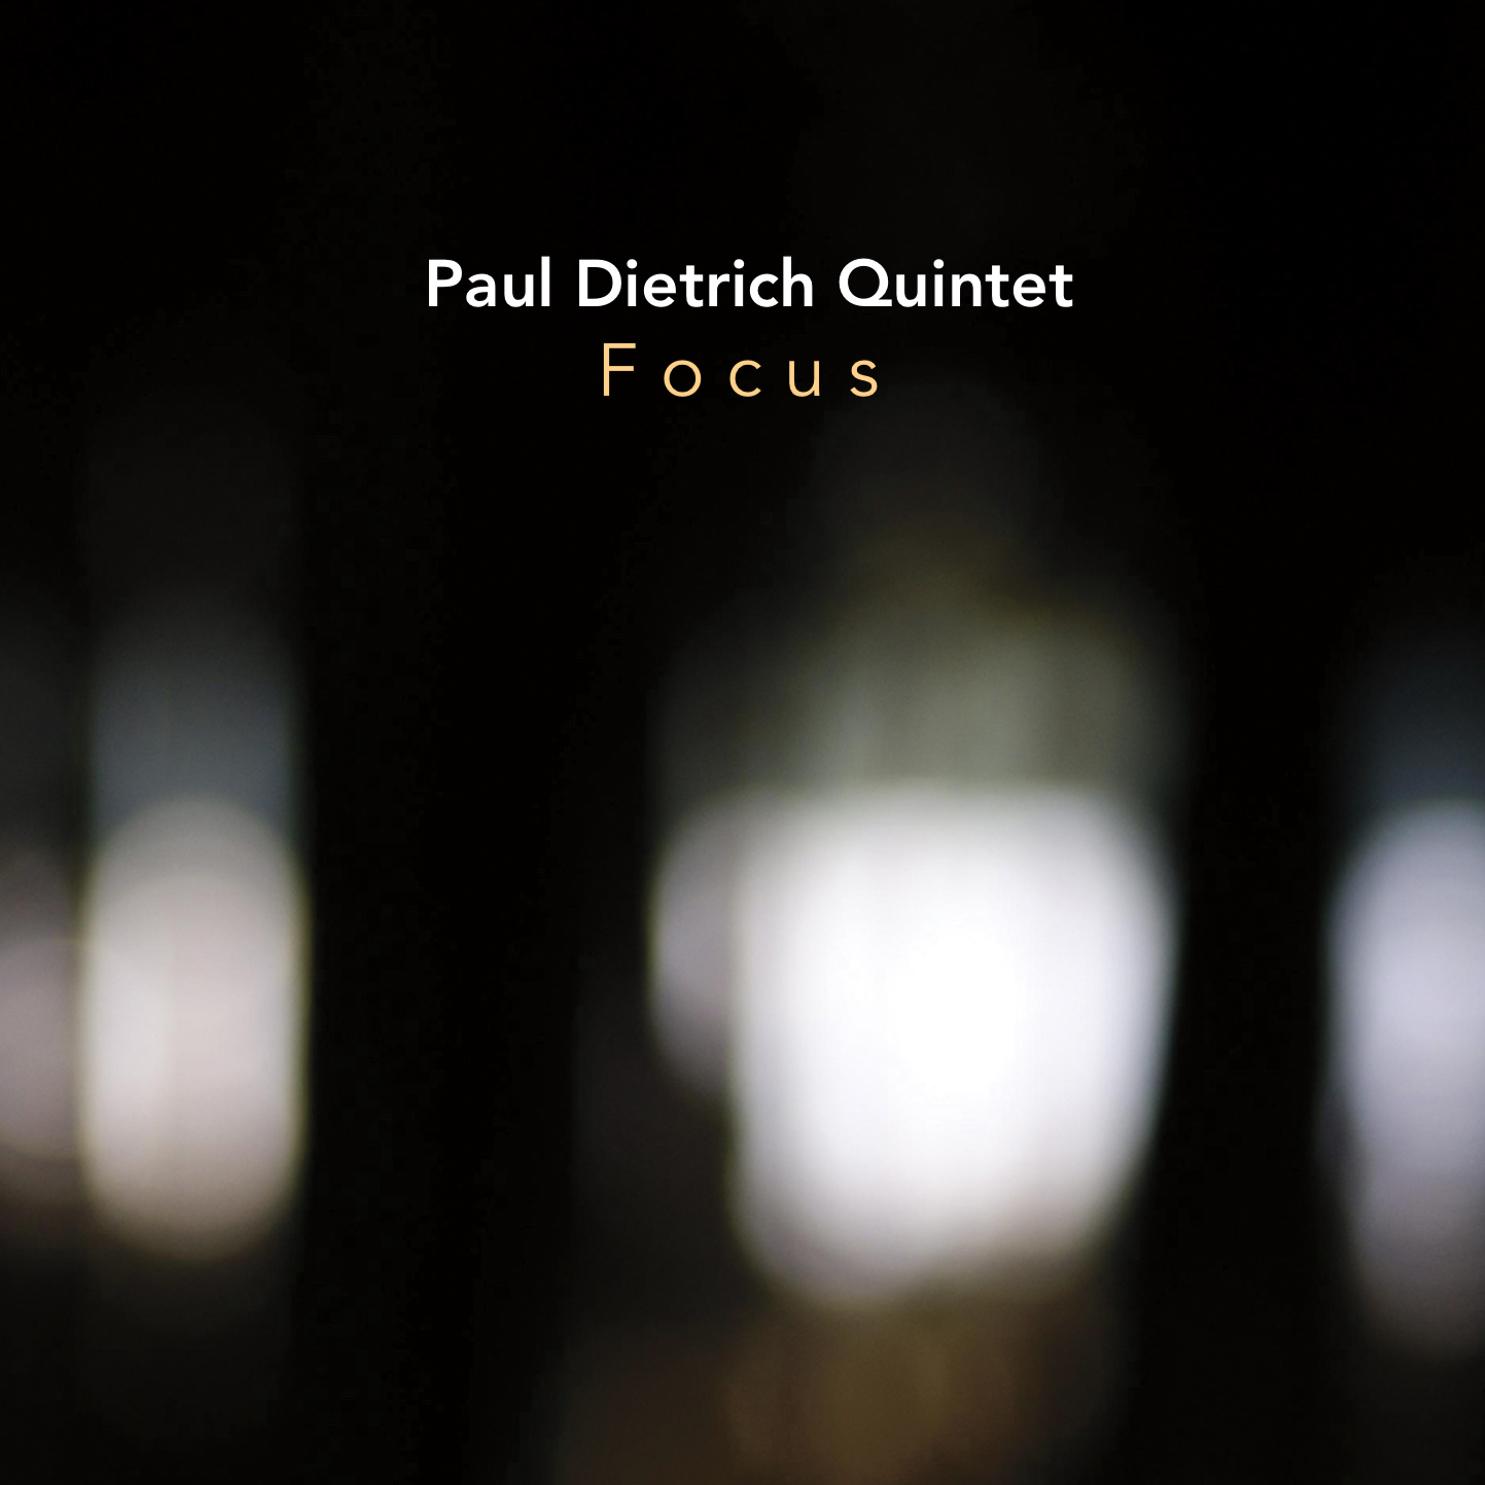 Paul Dietrich Quintet | Focus   buy:  MP3   CD   BandCamp   iTunes   Amazon